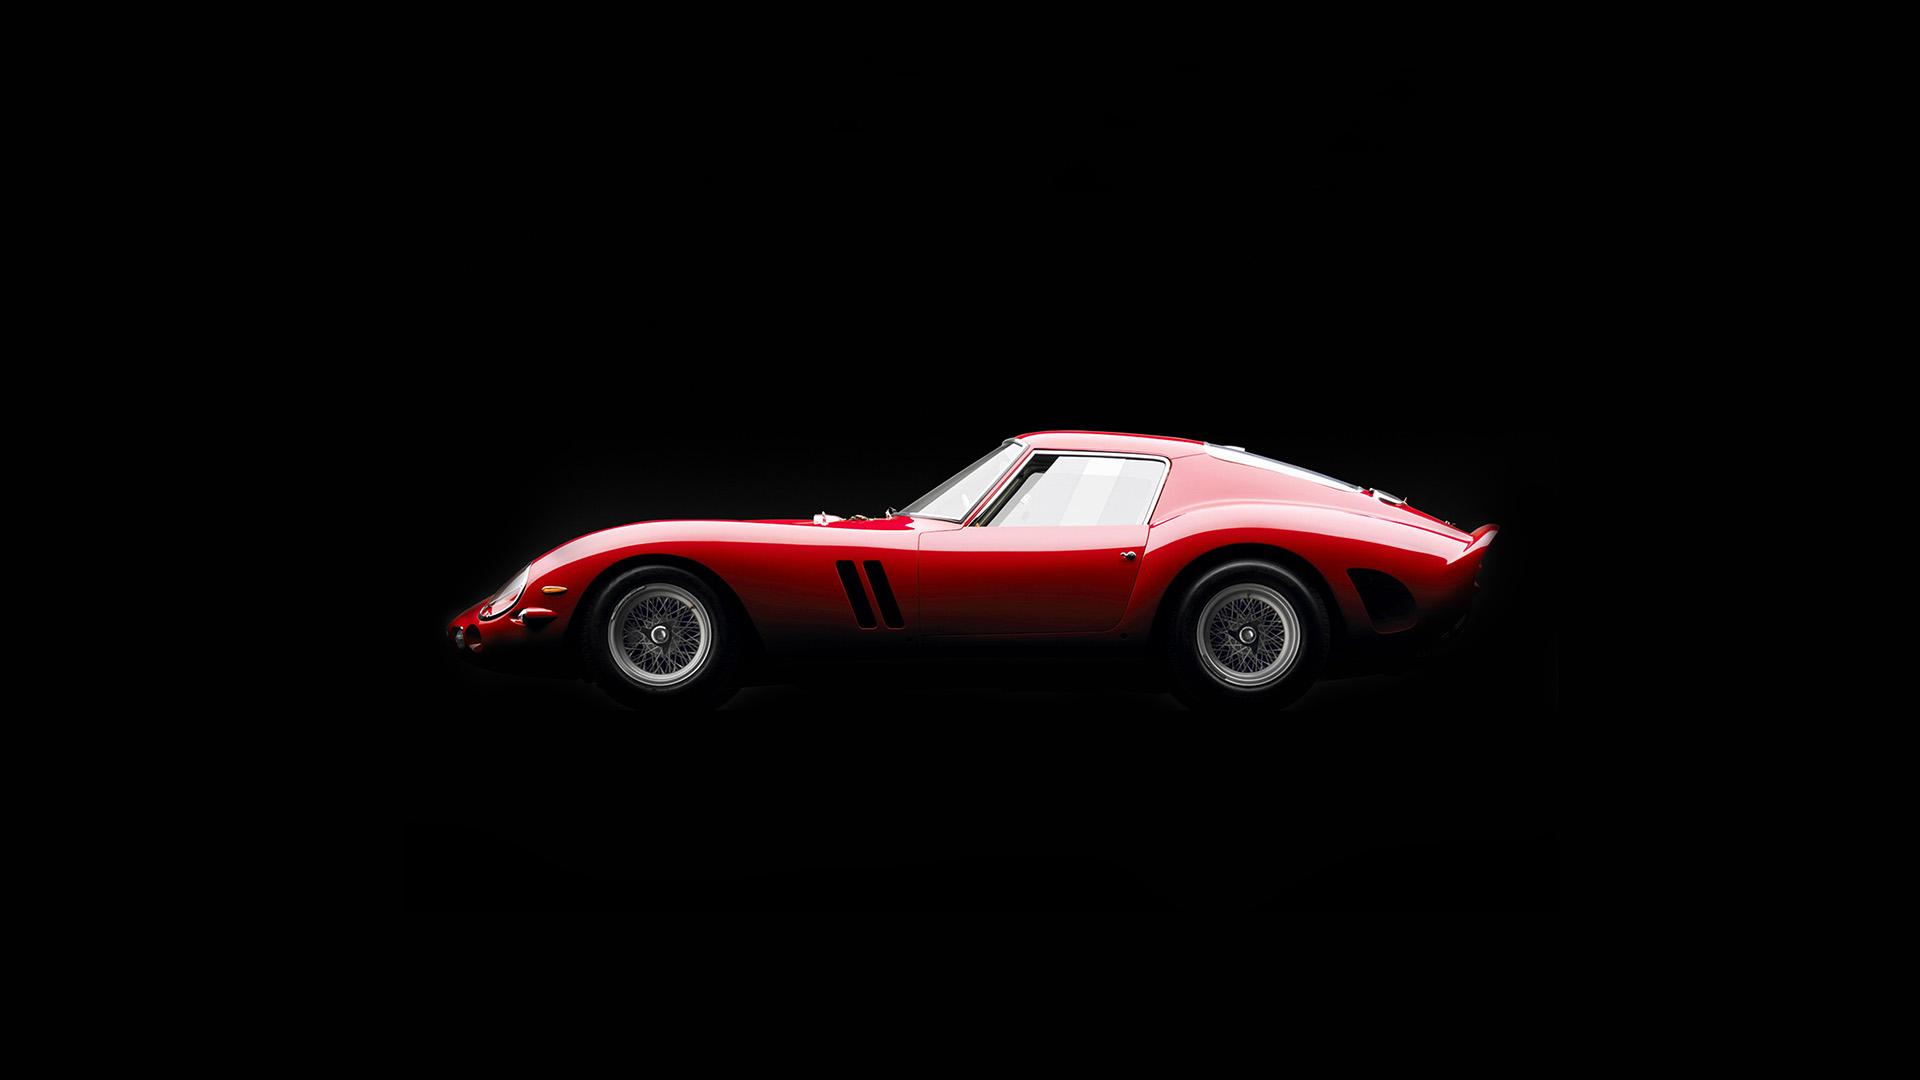 Wallpaper Muscle Cars Free Wallpaper For Desktop Laptop Aw61 Supercar Red Ferrari